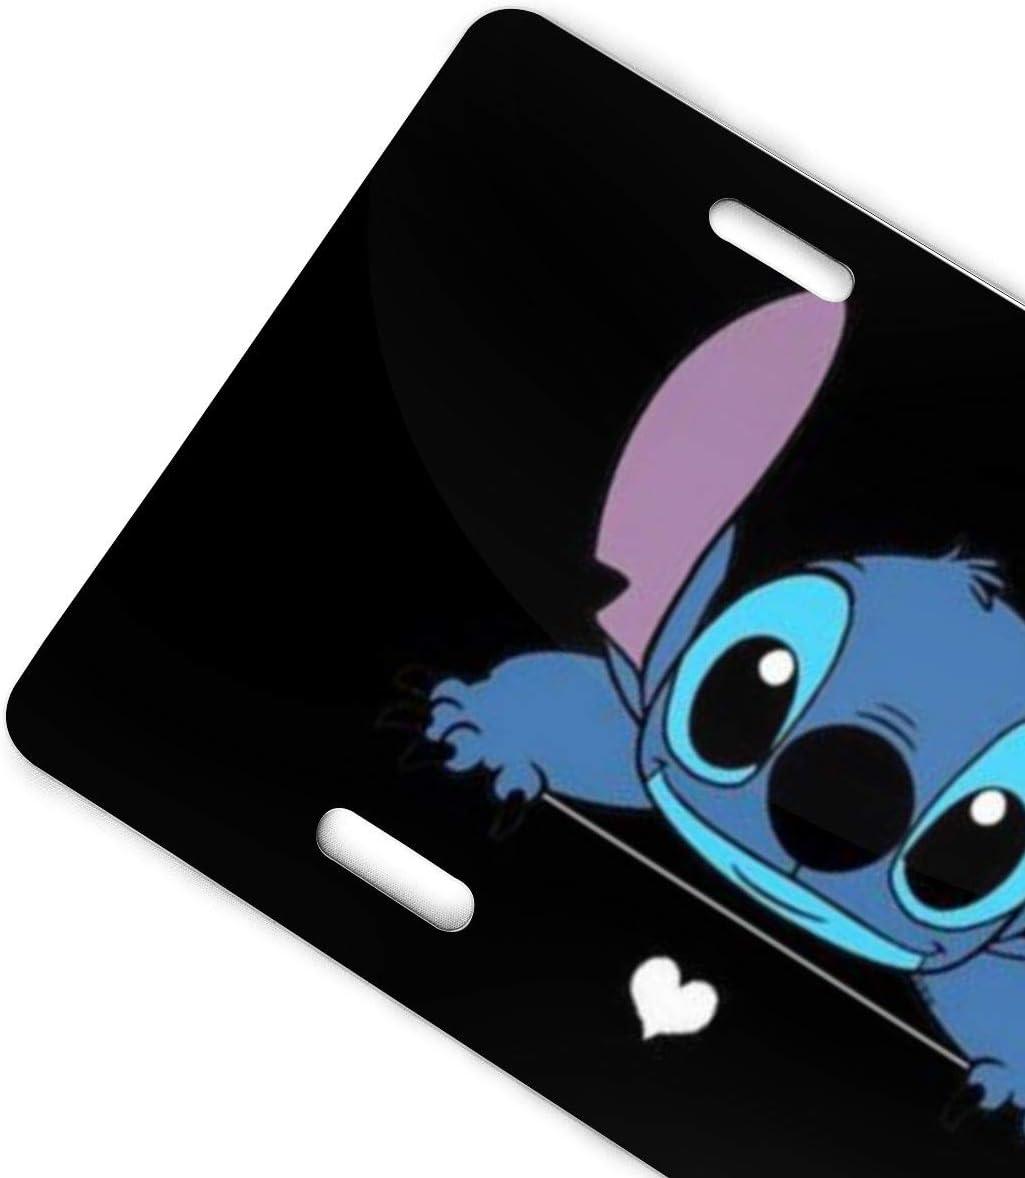 Stitch Ice Cream License Plate Sign Tag Car Accessories 12 X 6 in